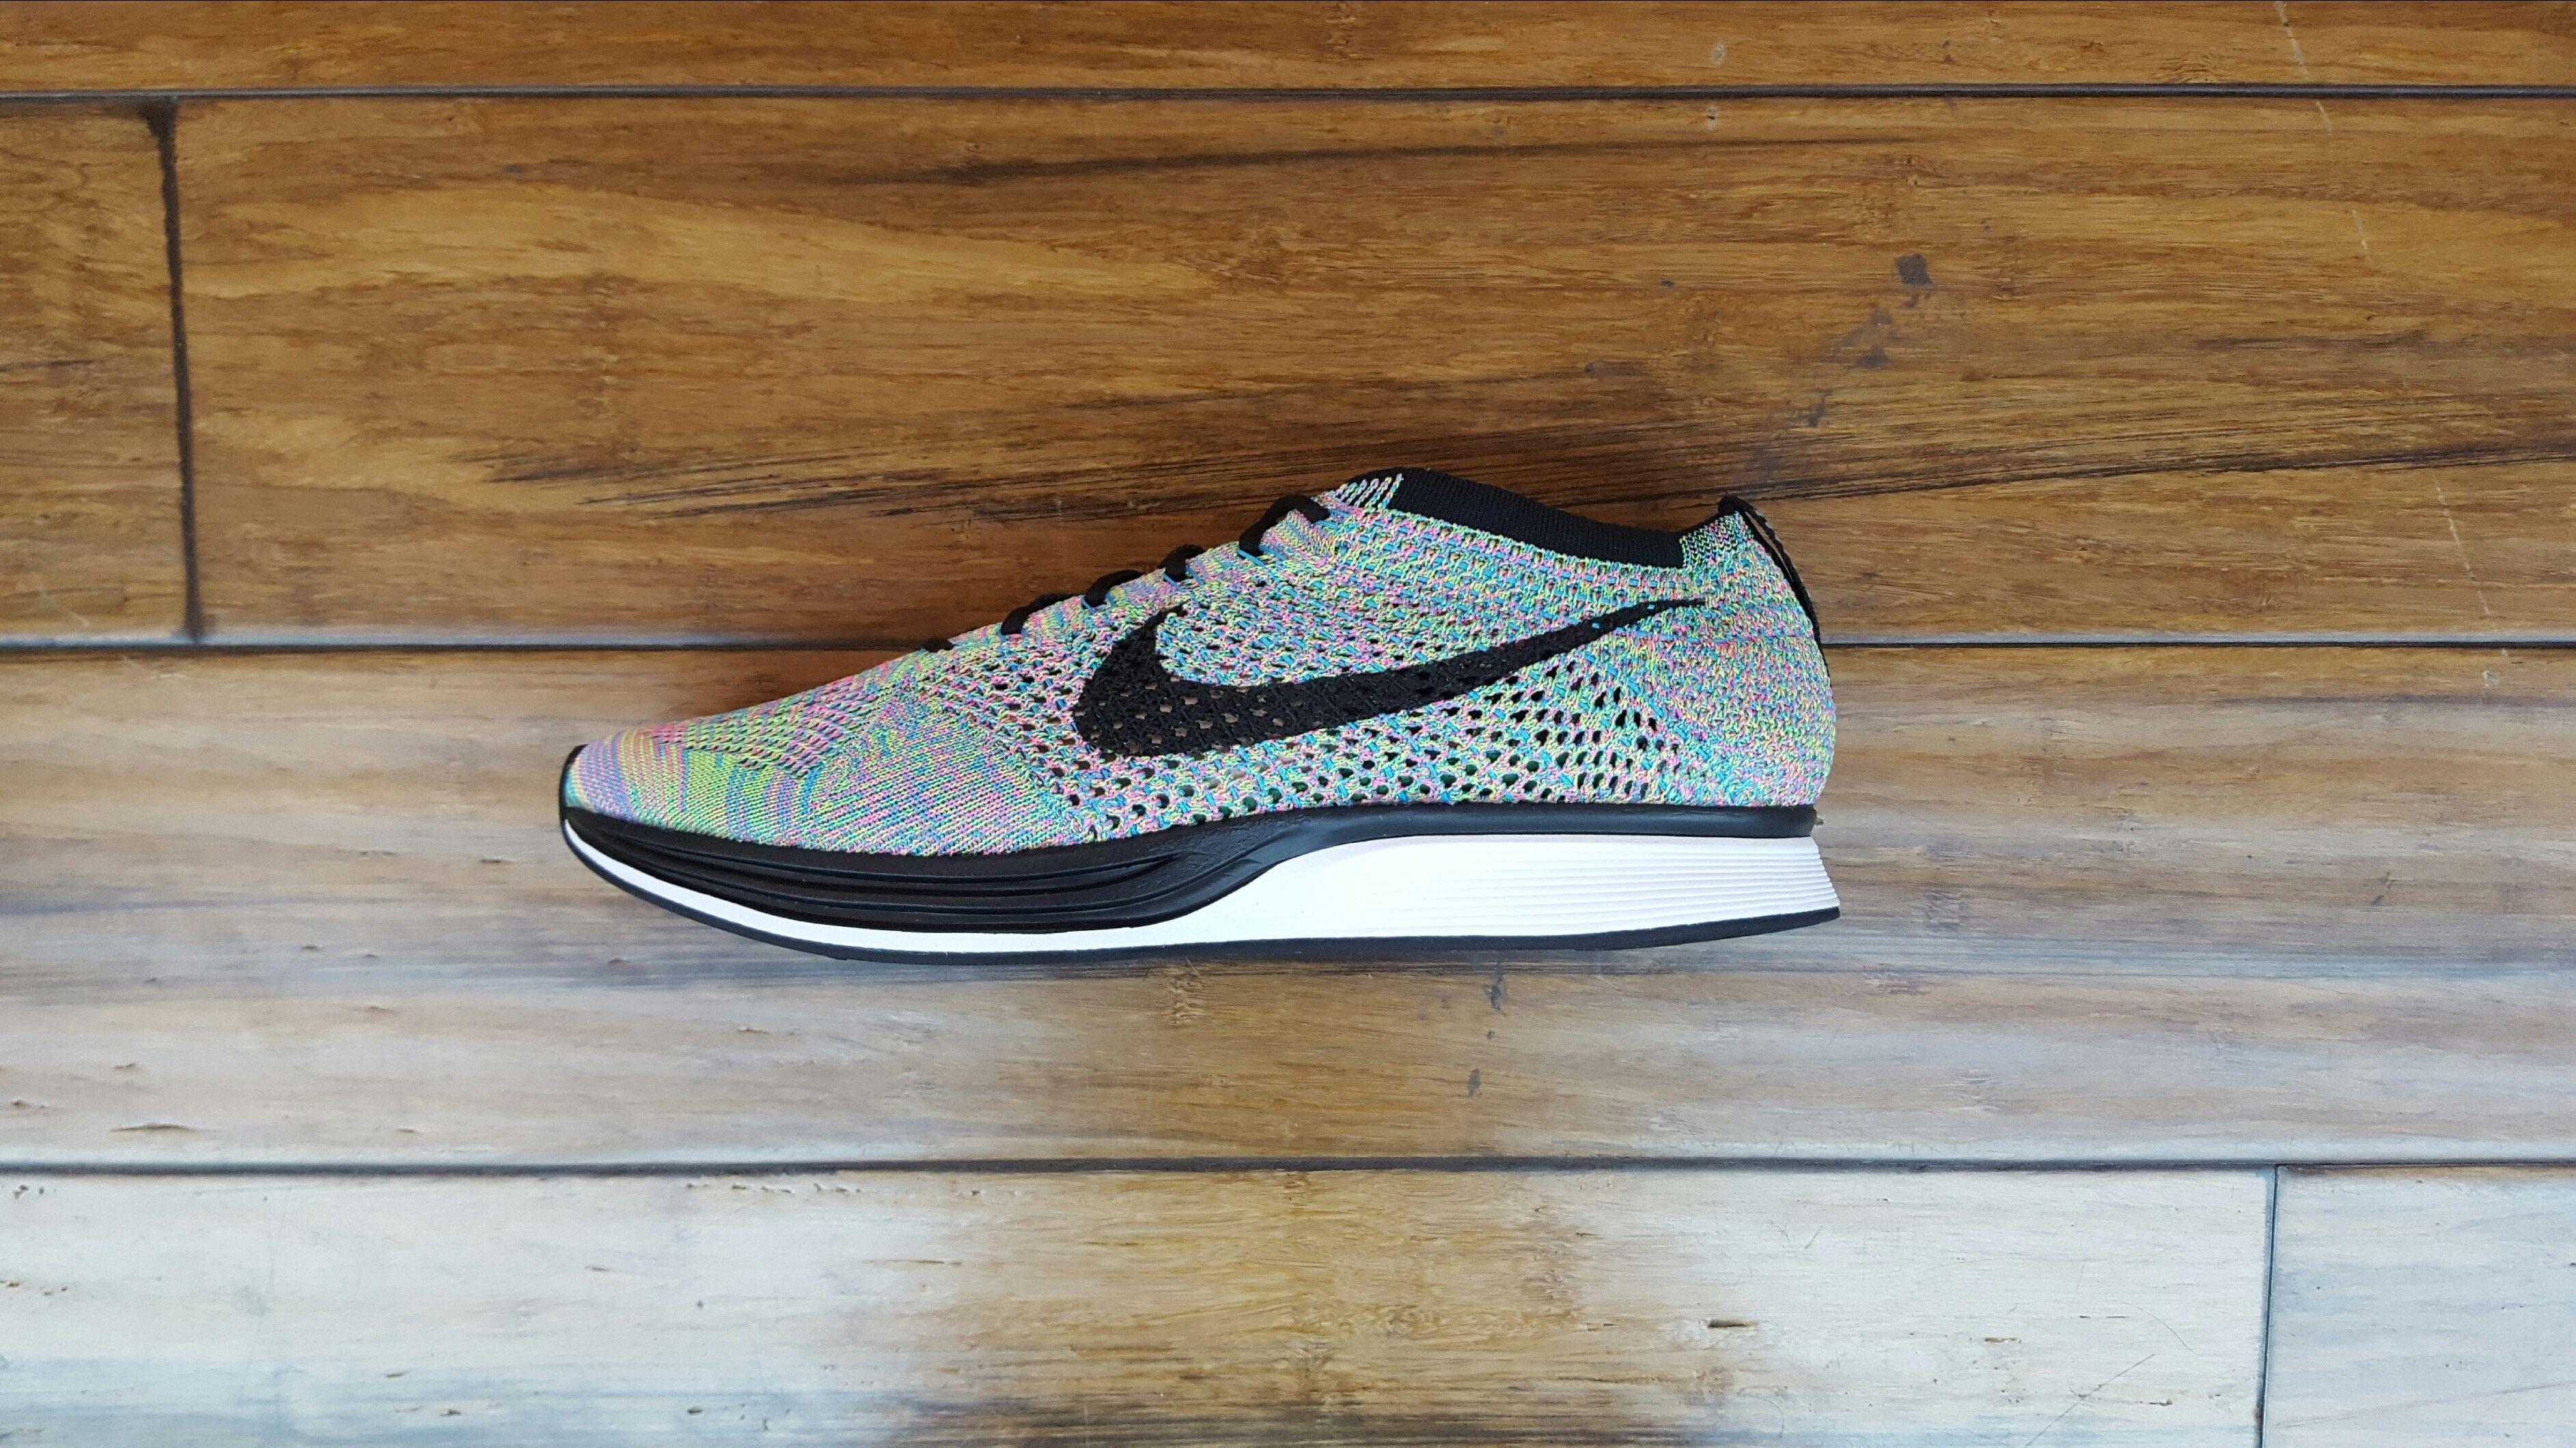 ad0cfe1255160 ... Nike Flyknit Racer Oreo Más de 25 ideas increíbles sobre Multicolor  flyknit en Pinterest Flyknit racer multicolor